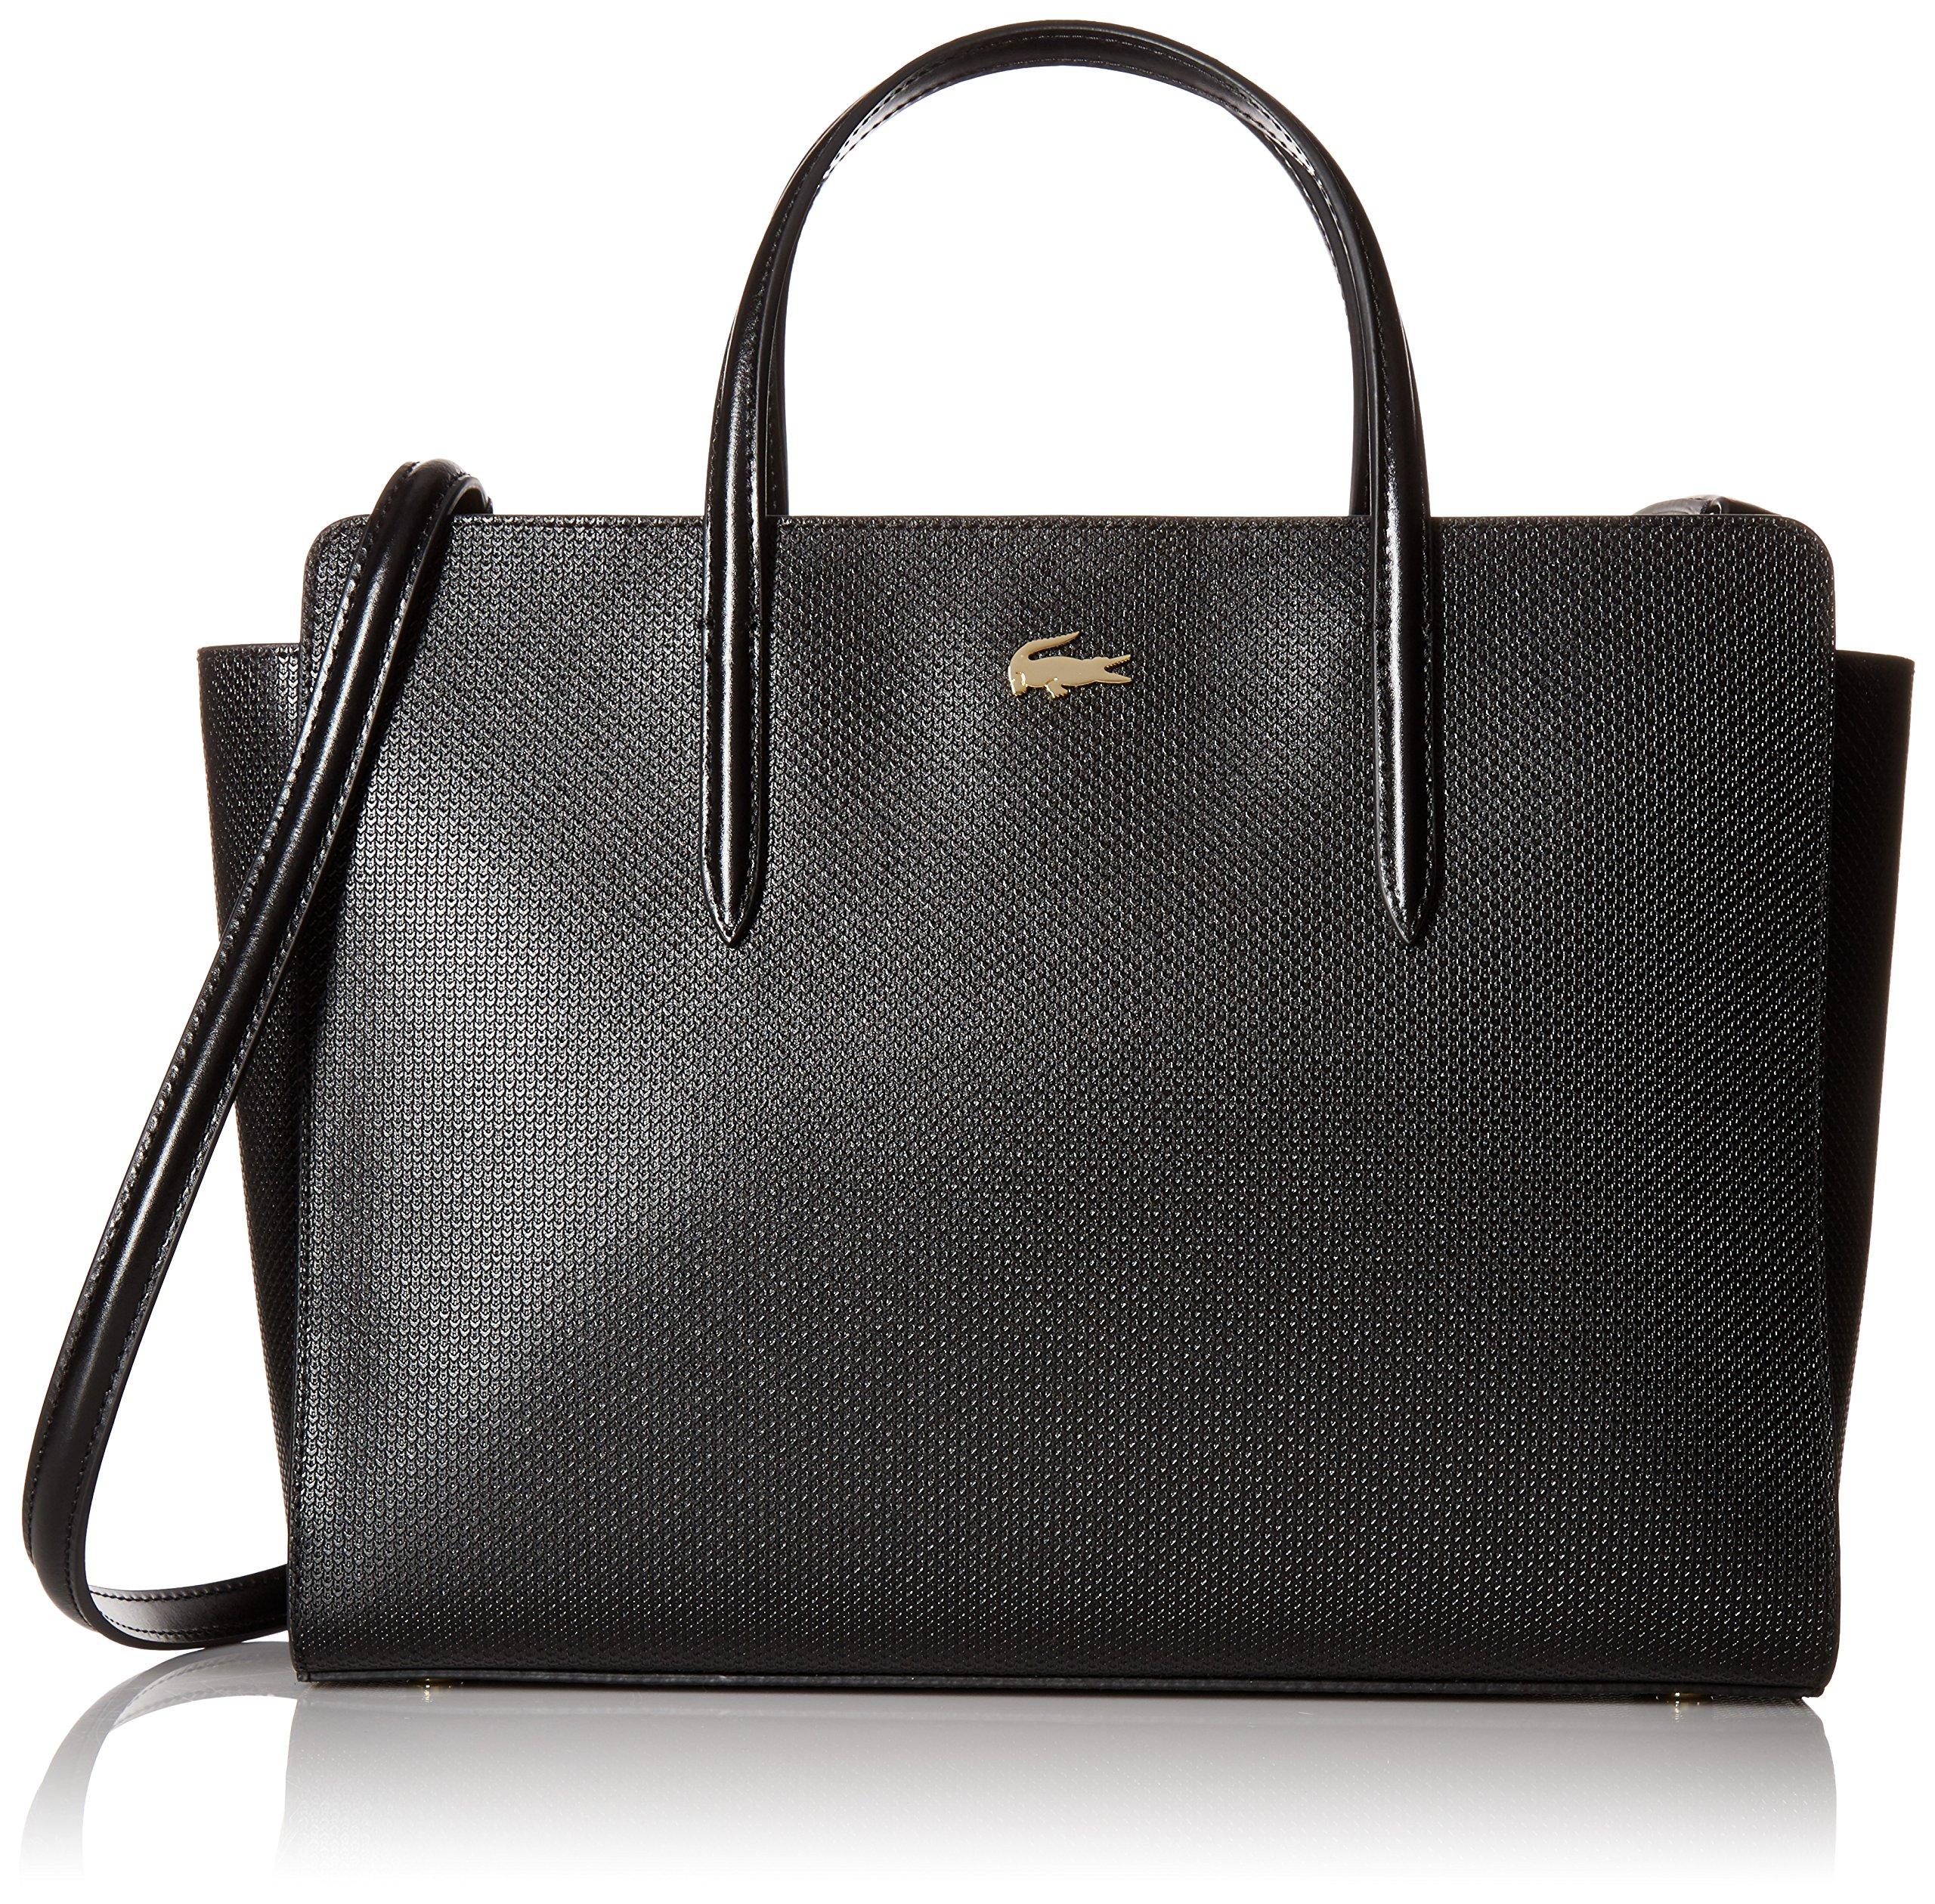 Lacoste Chantaco Shopping Bag, Black